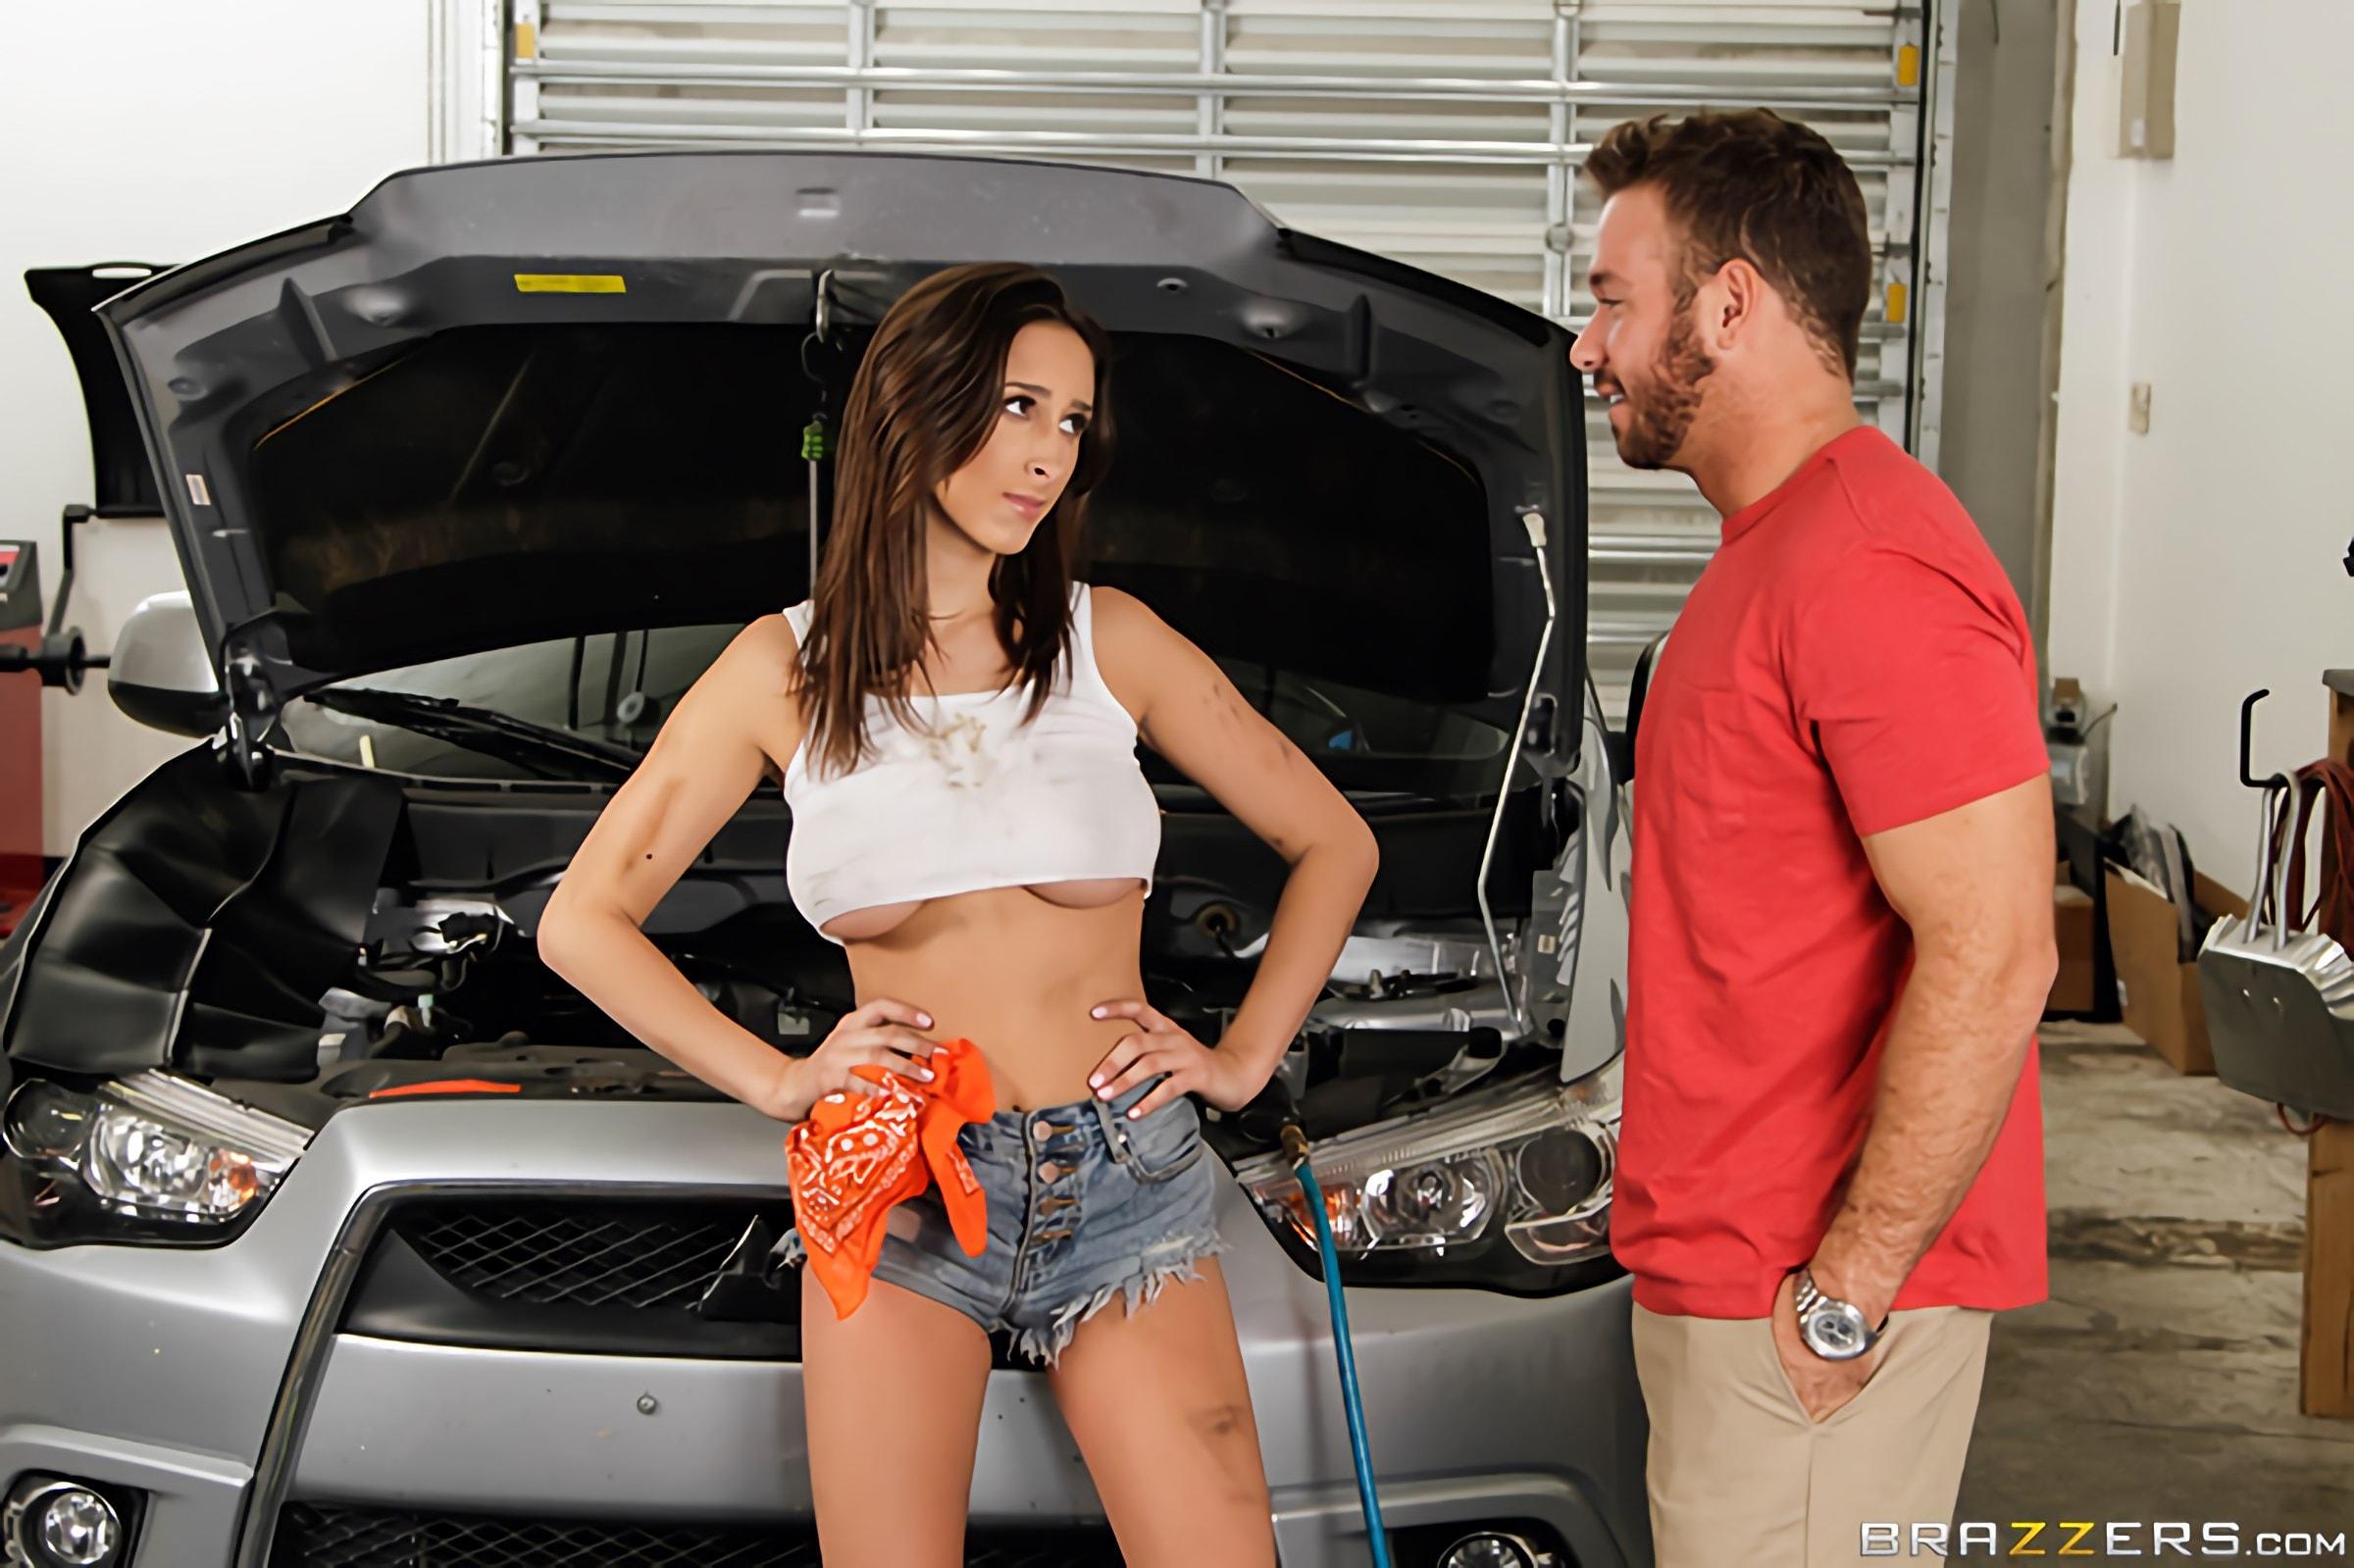 Brazzers 'The Mechanic' starring Ashley Adams (Photo 1)